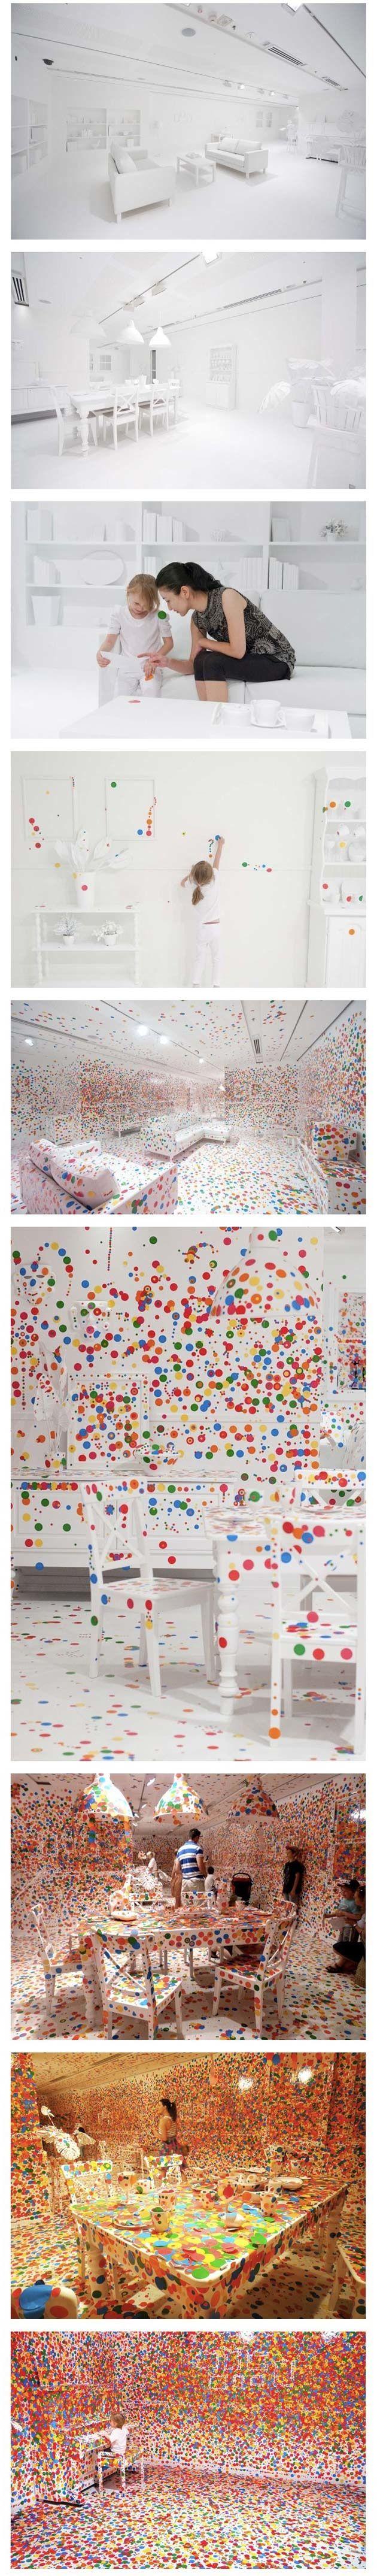 Dots, Dots, dotsArtists, Funny Things, Modern Art, Colors, Stickers, Yayoi Kusama, White Rooms, Art Installations, Kids